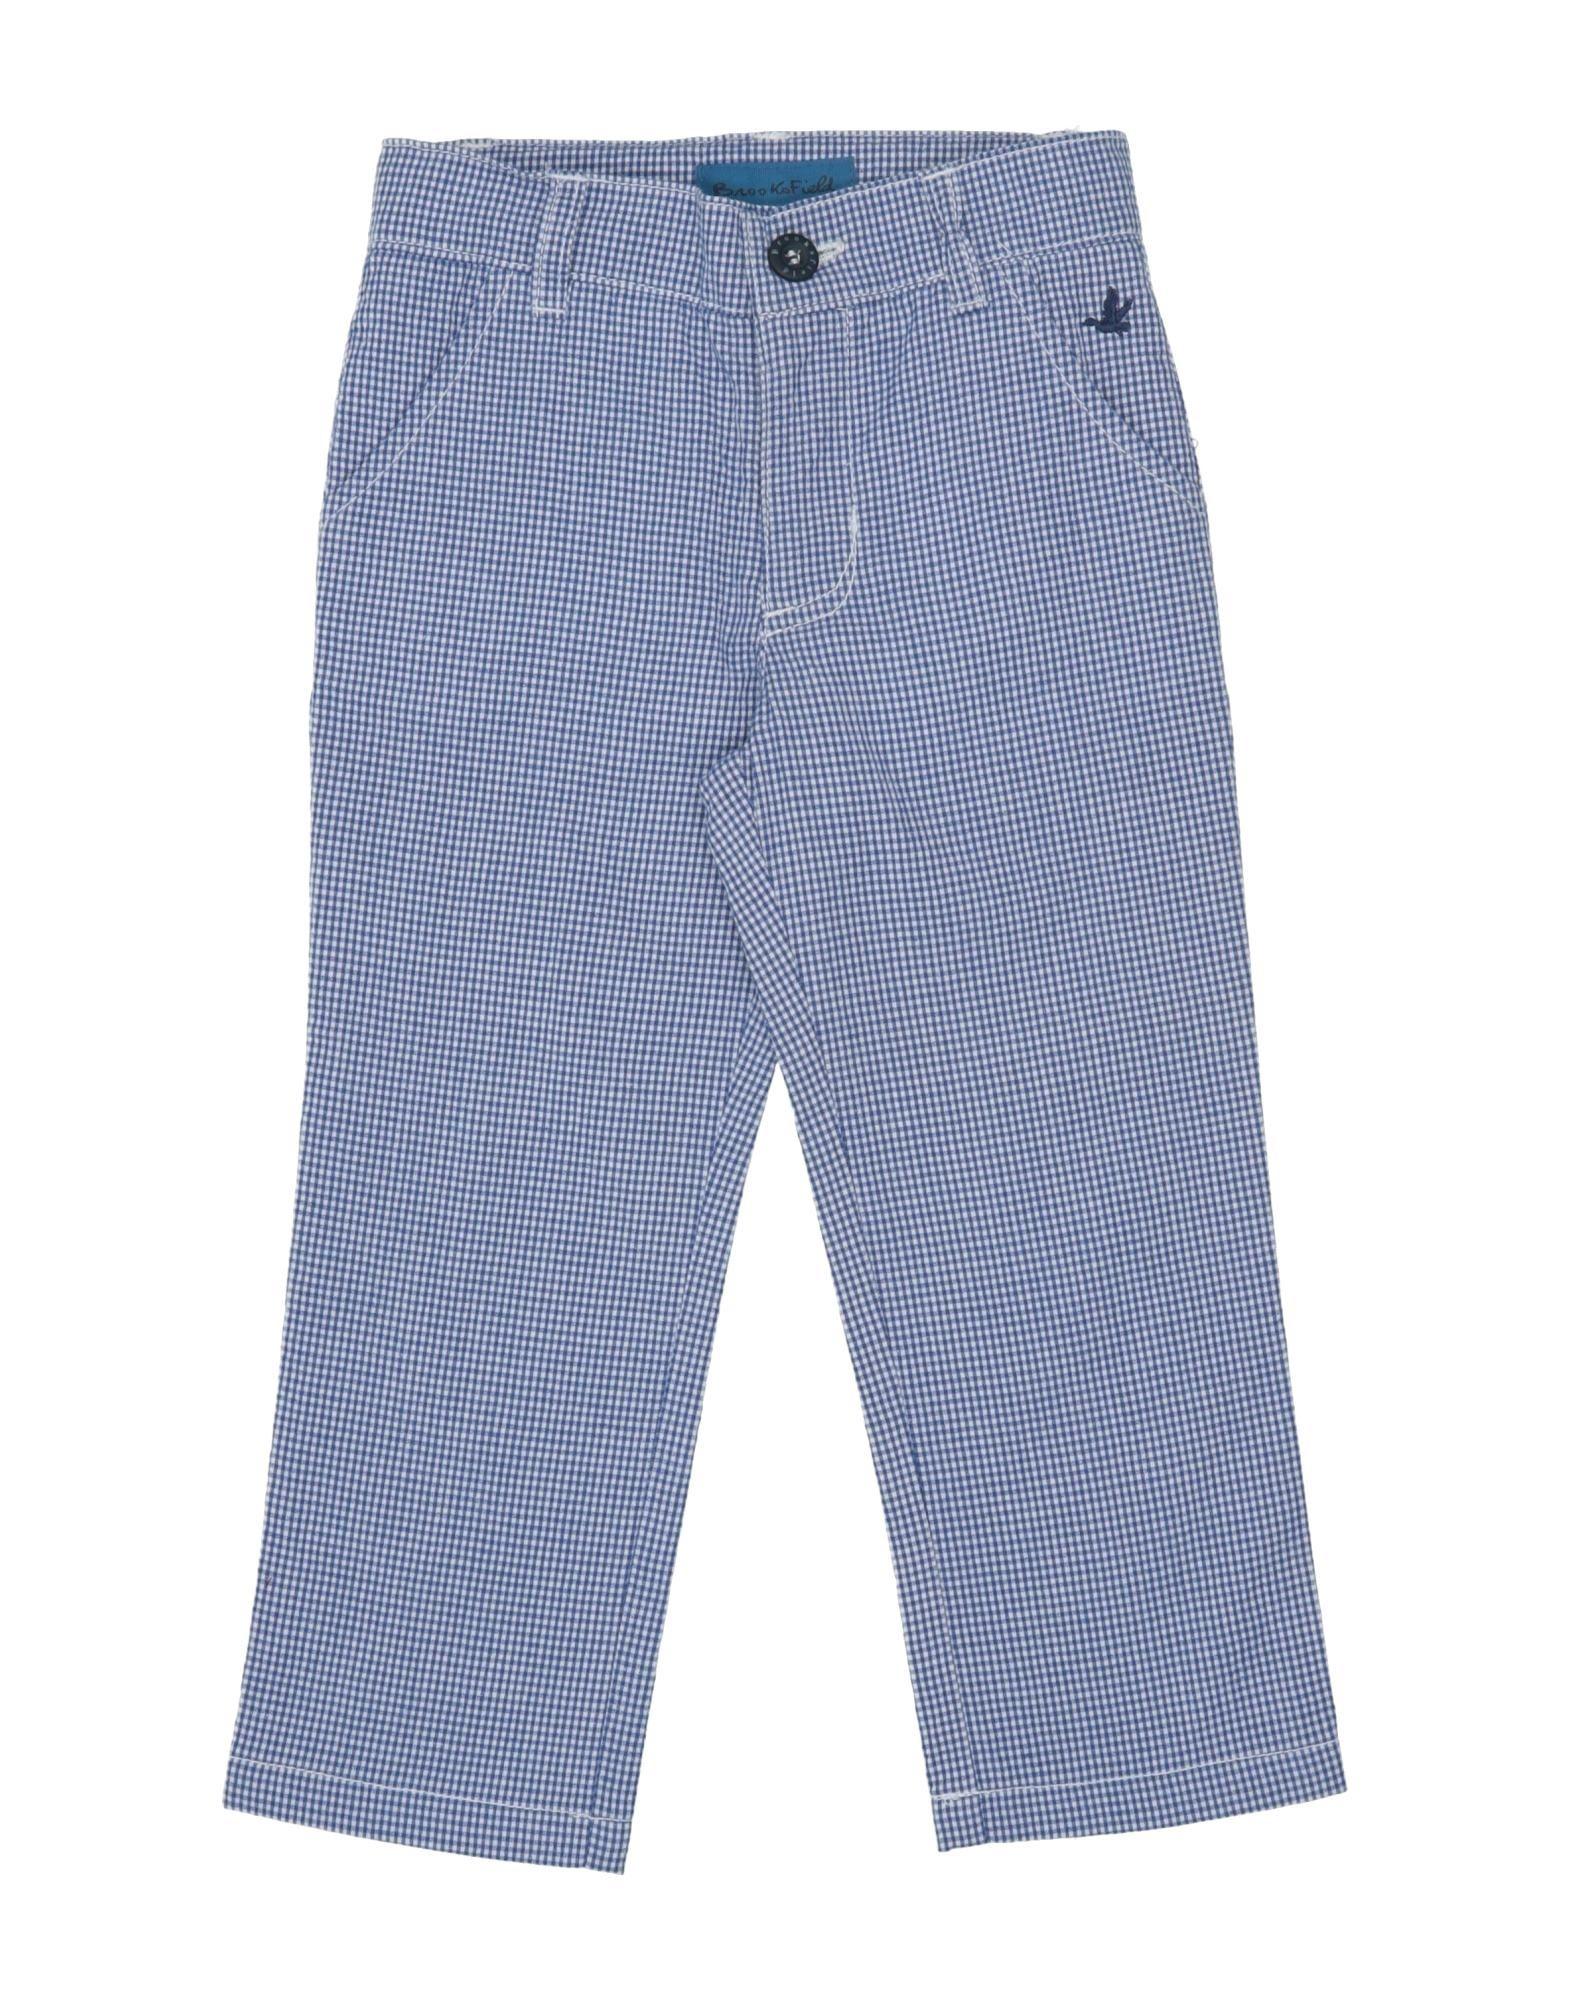 Brooksfield Kids' Casual Pants In Blue